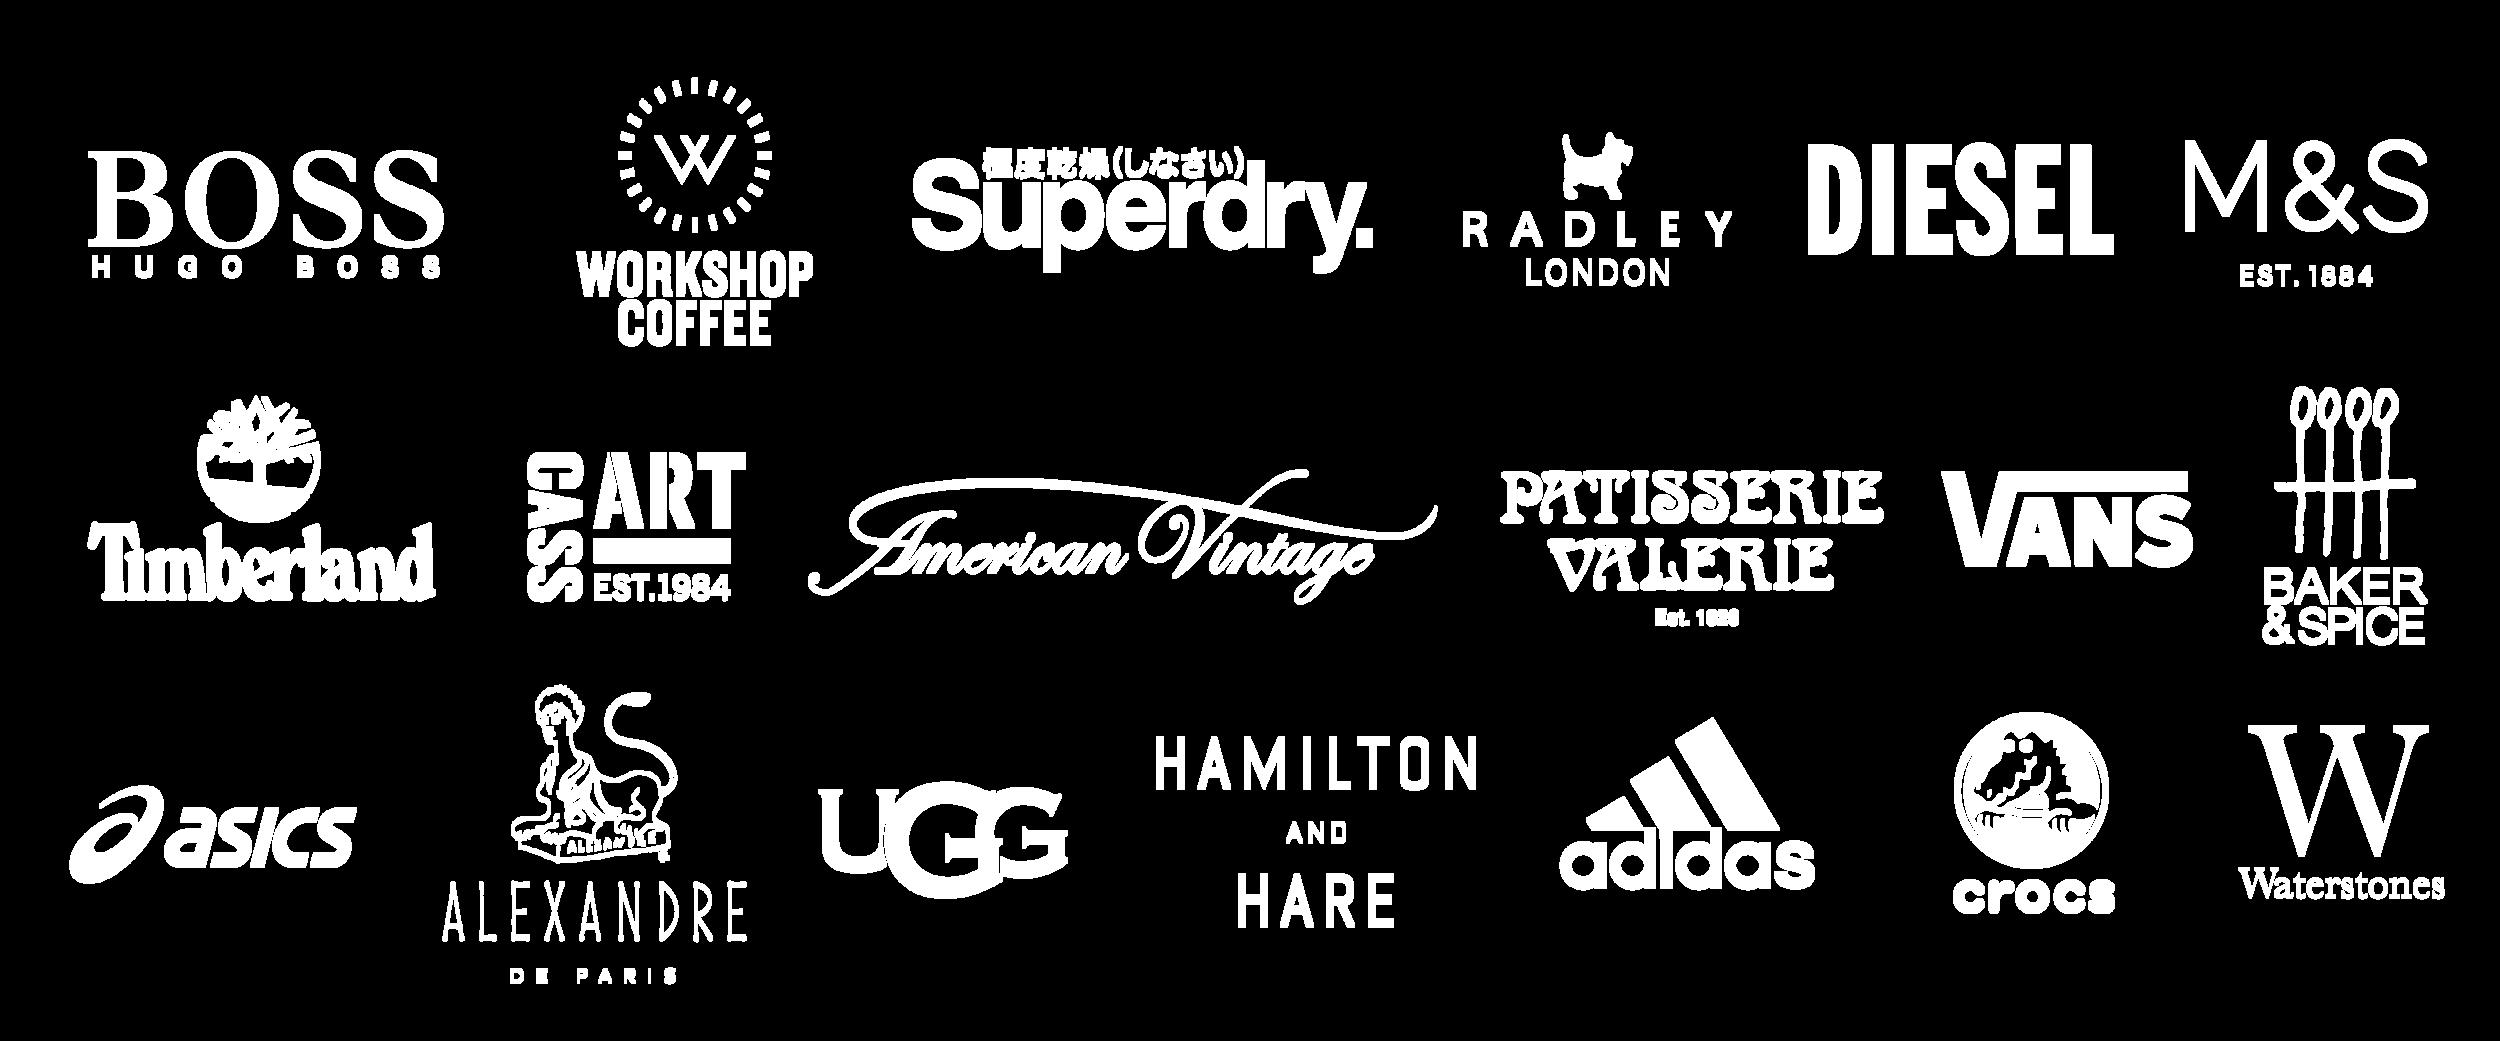 AUR-WRC logos 0919b-01.png